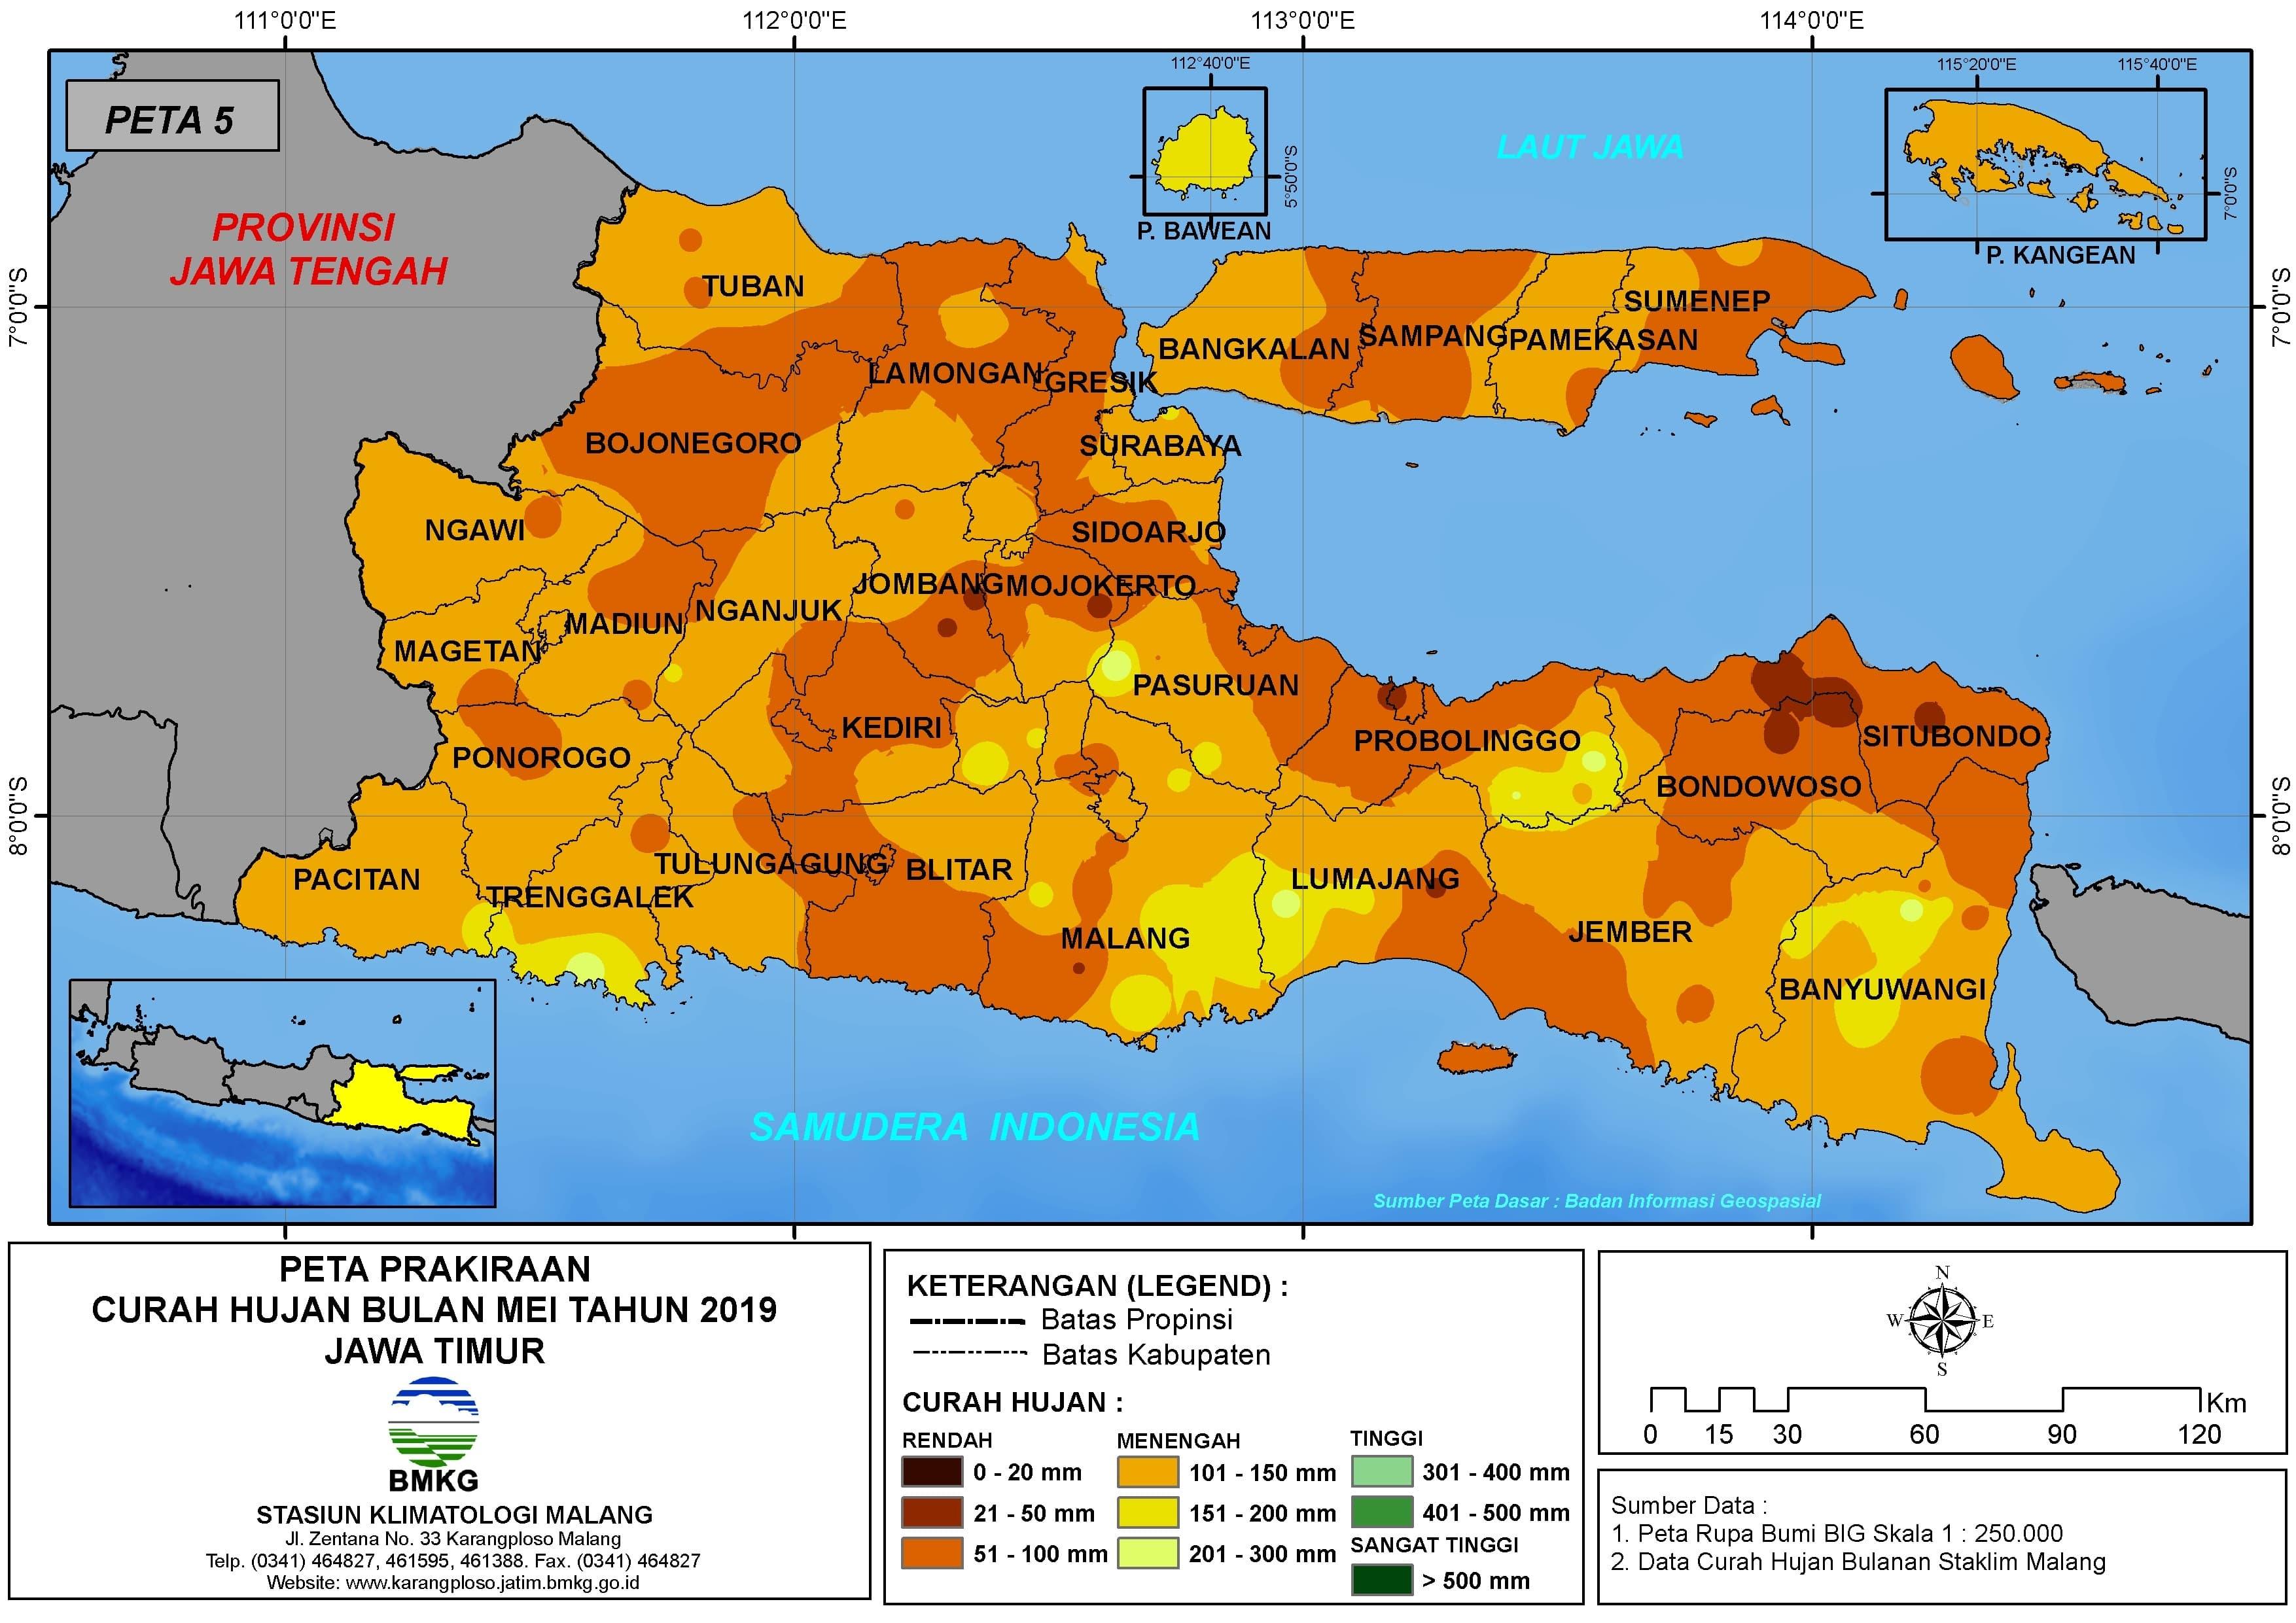 Peta Prakiraan-Bulanan Curah Hujan Bulan MEI Tahun 2019 di Provinsi Jawa Timur Update dari Analisis Bulan Maret 2019